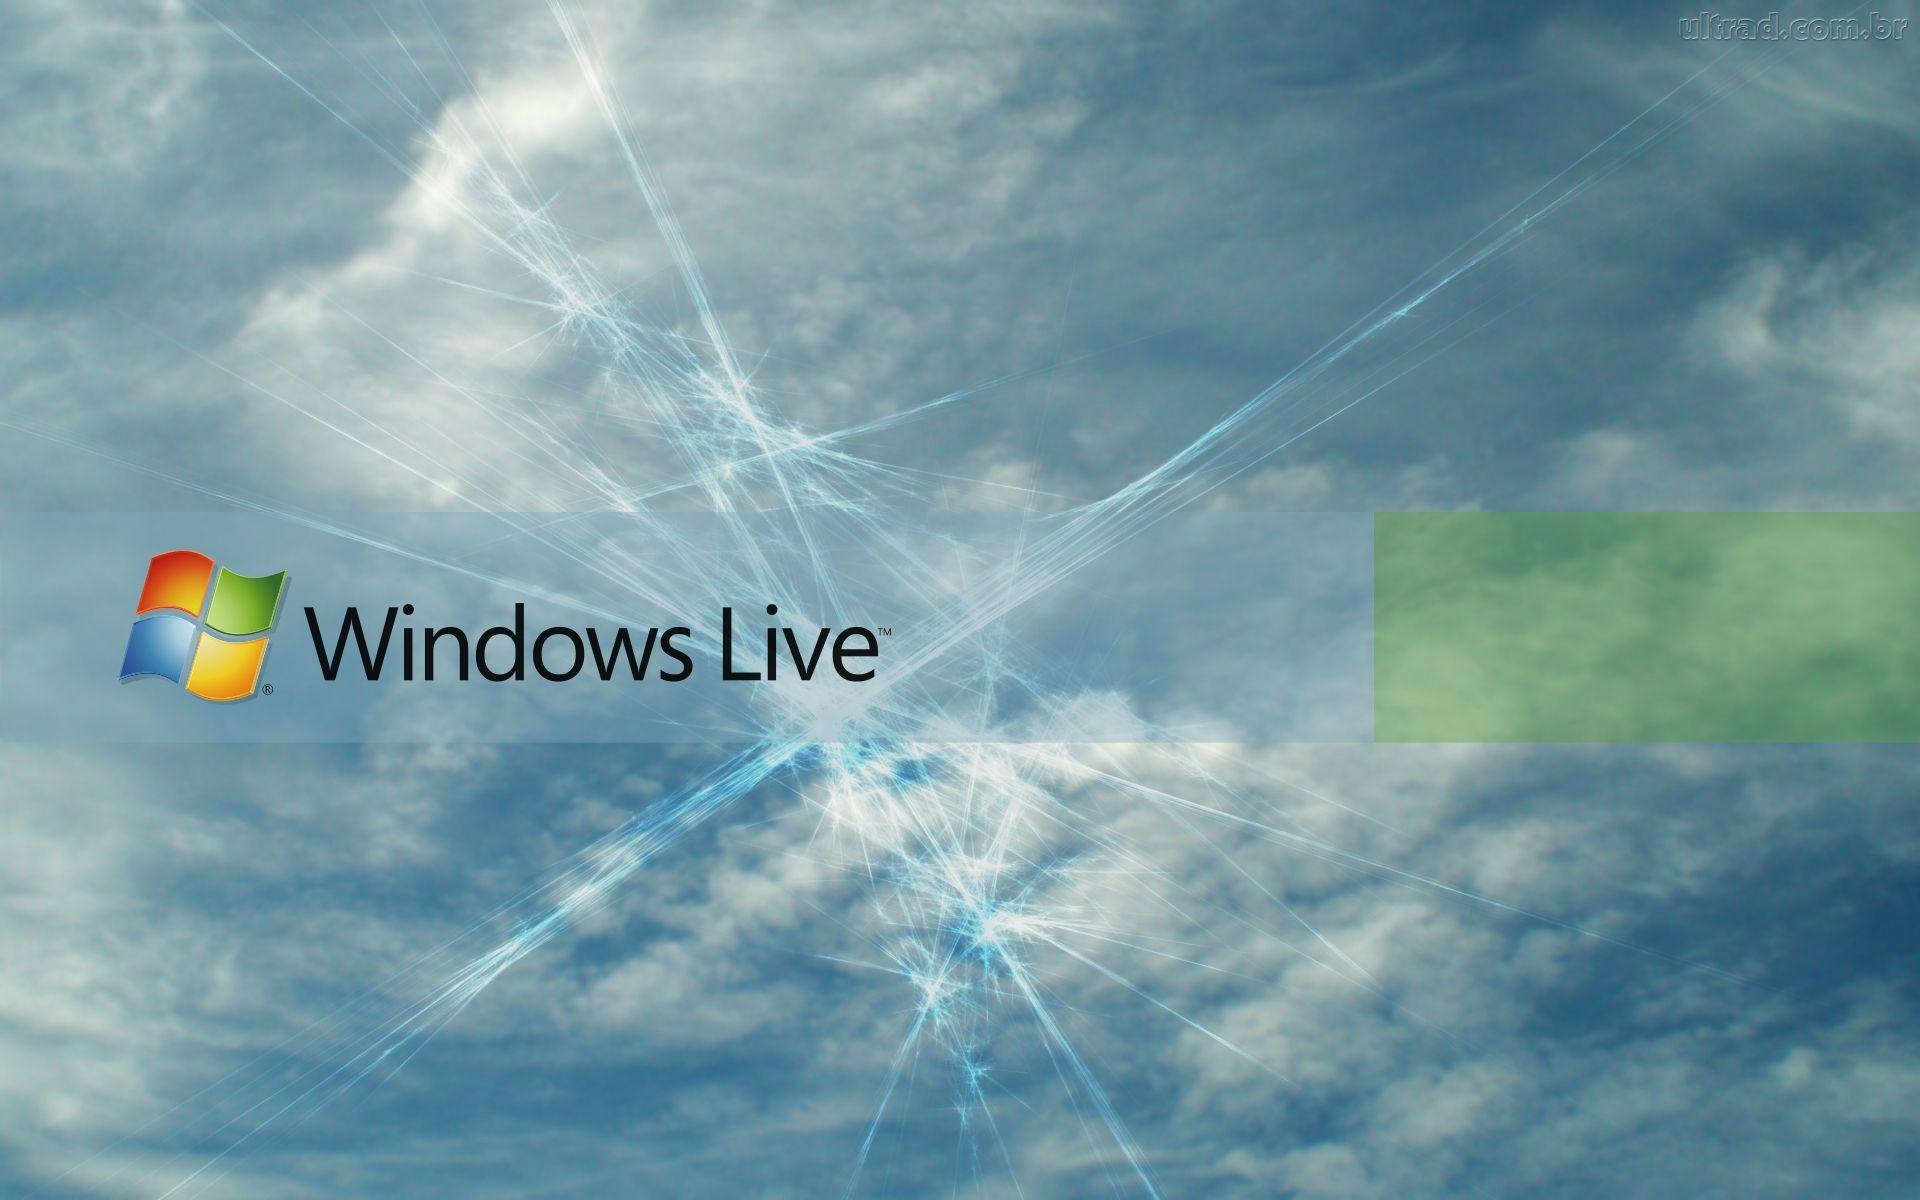 LIVE WALLPAPERS WINDOWS 8 - Microsoft Community